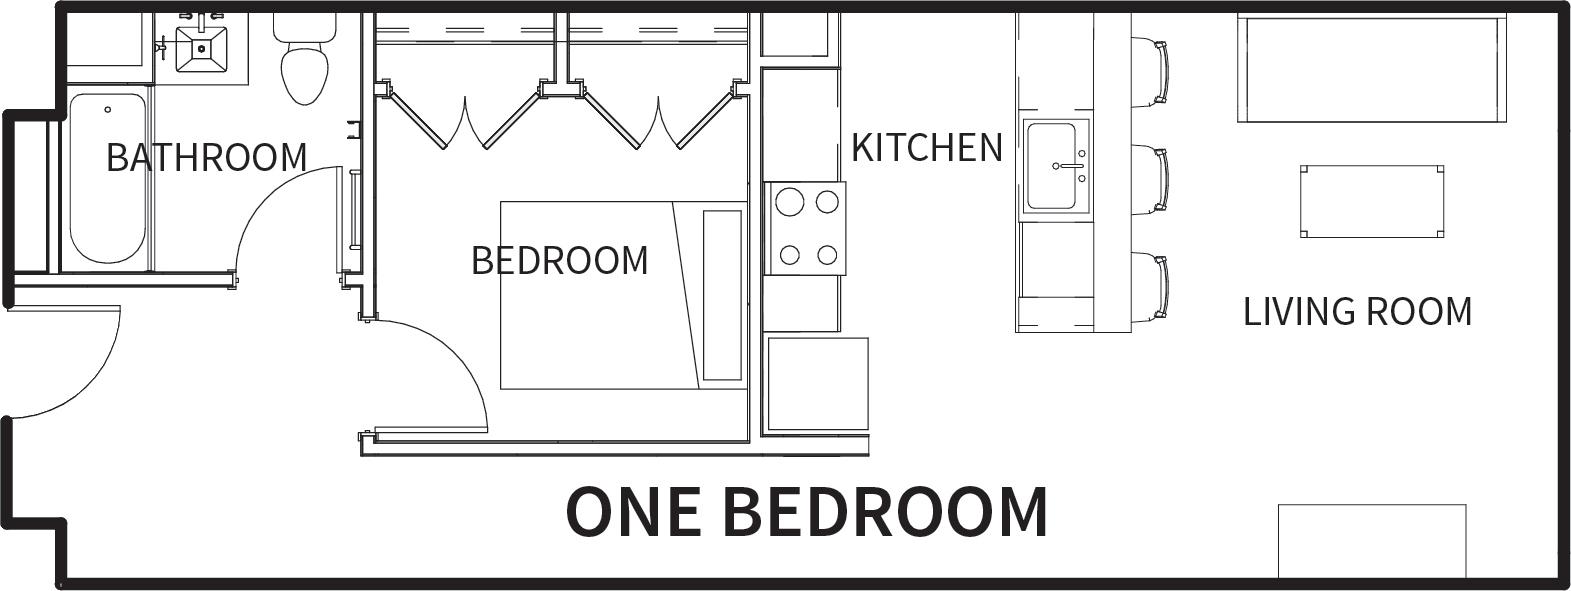 J-centrel philadelphia apartments lower rent